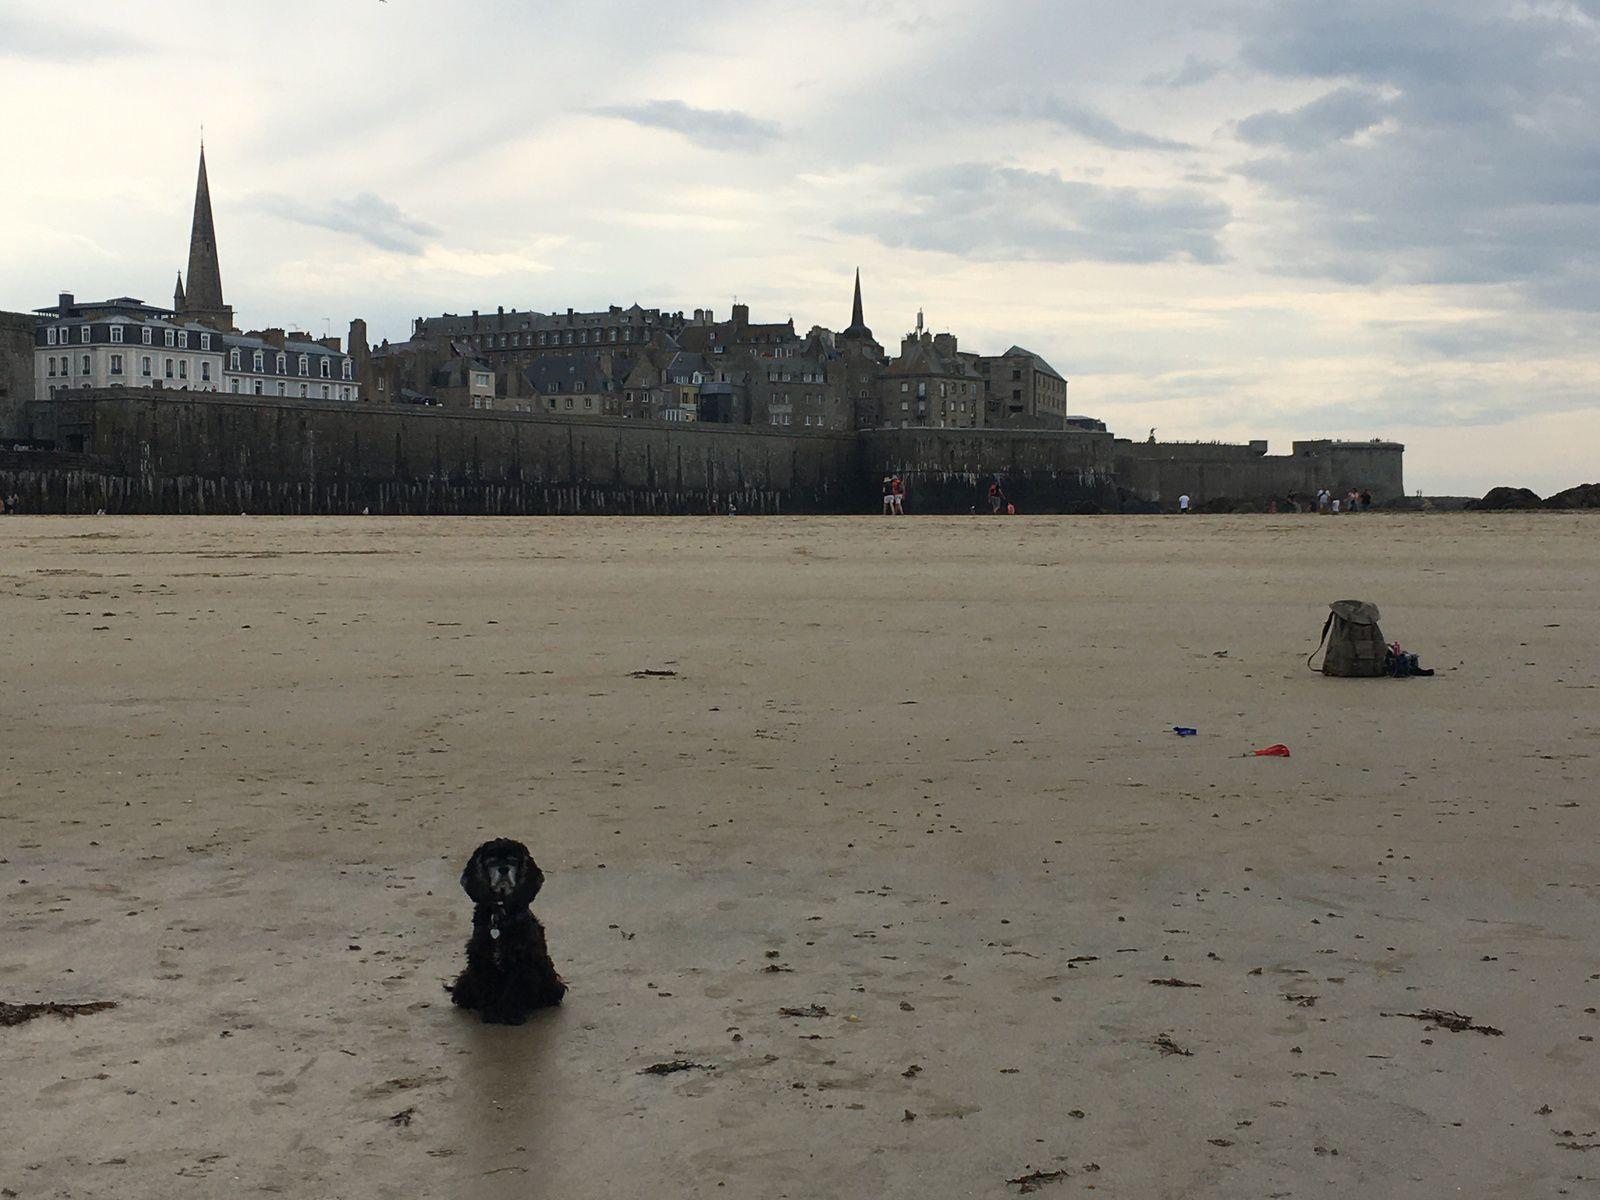 15 septembre 2020 : Saint-Malo (France)